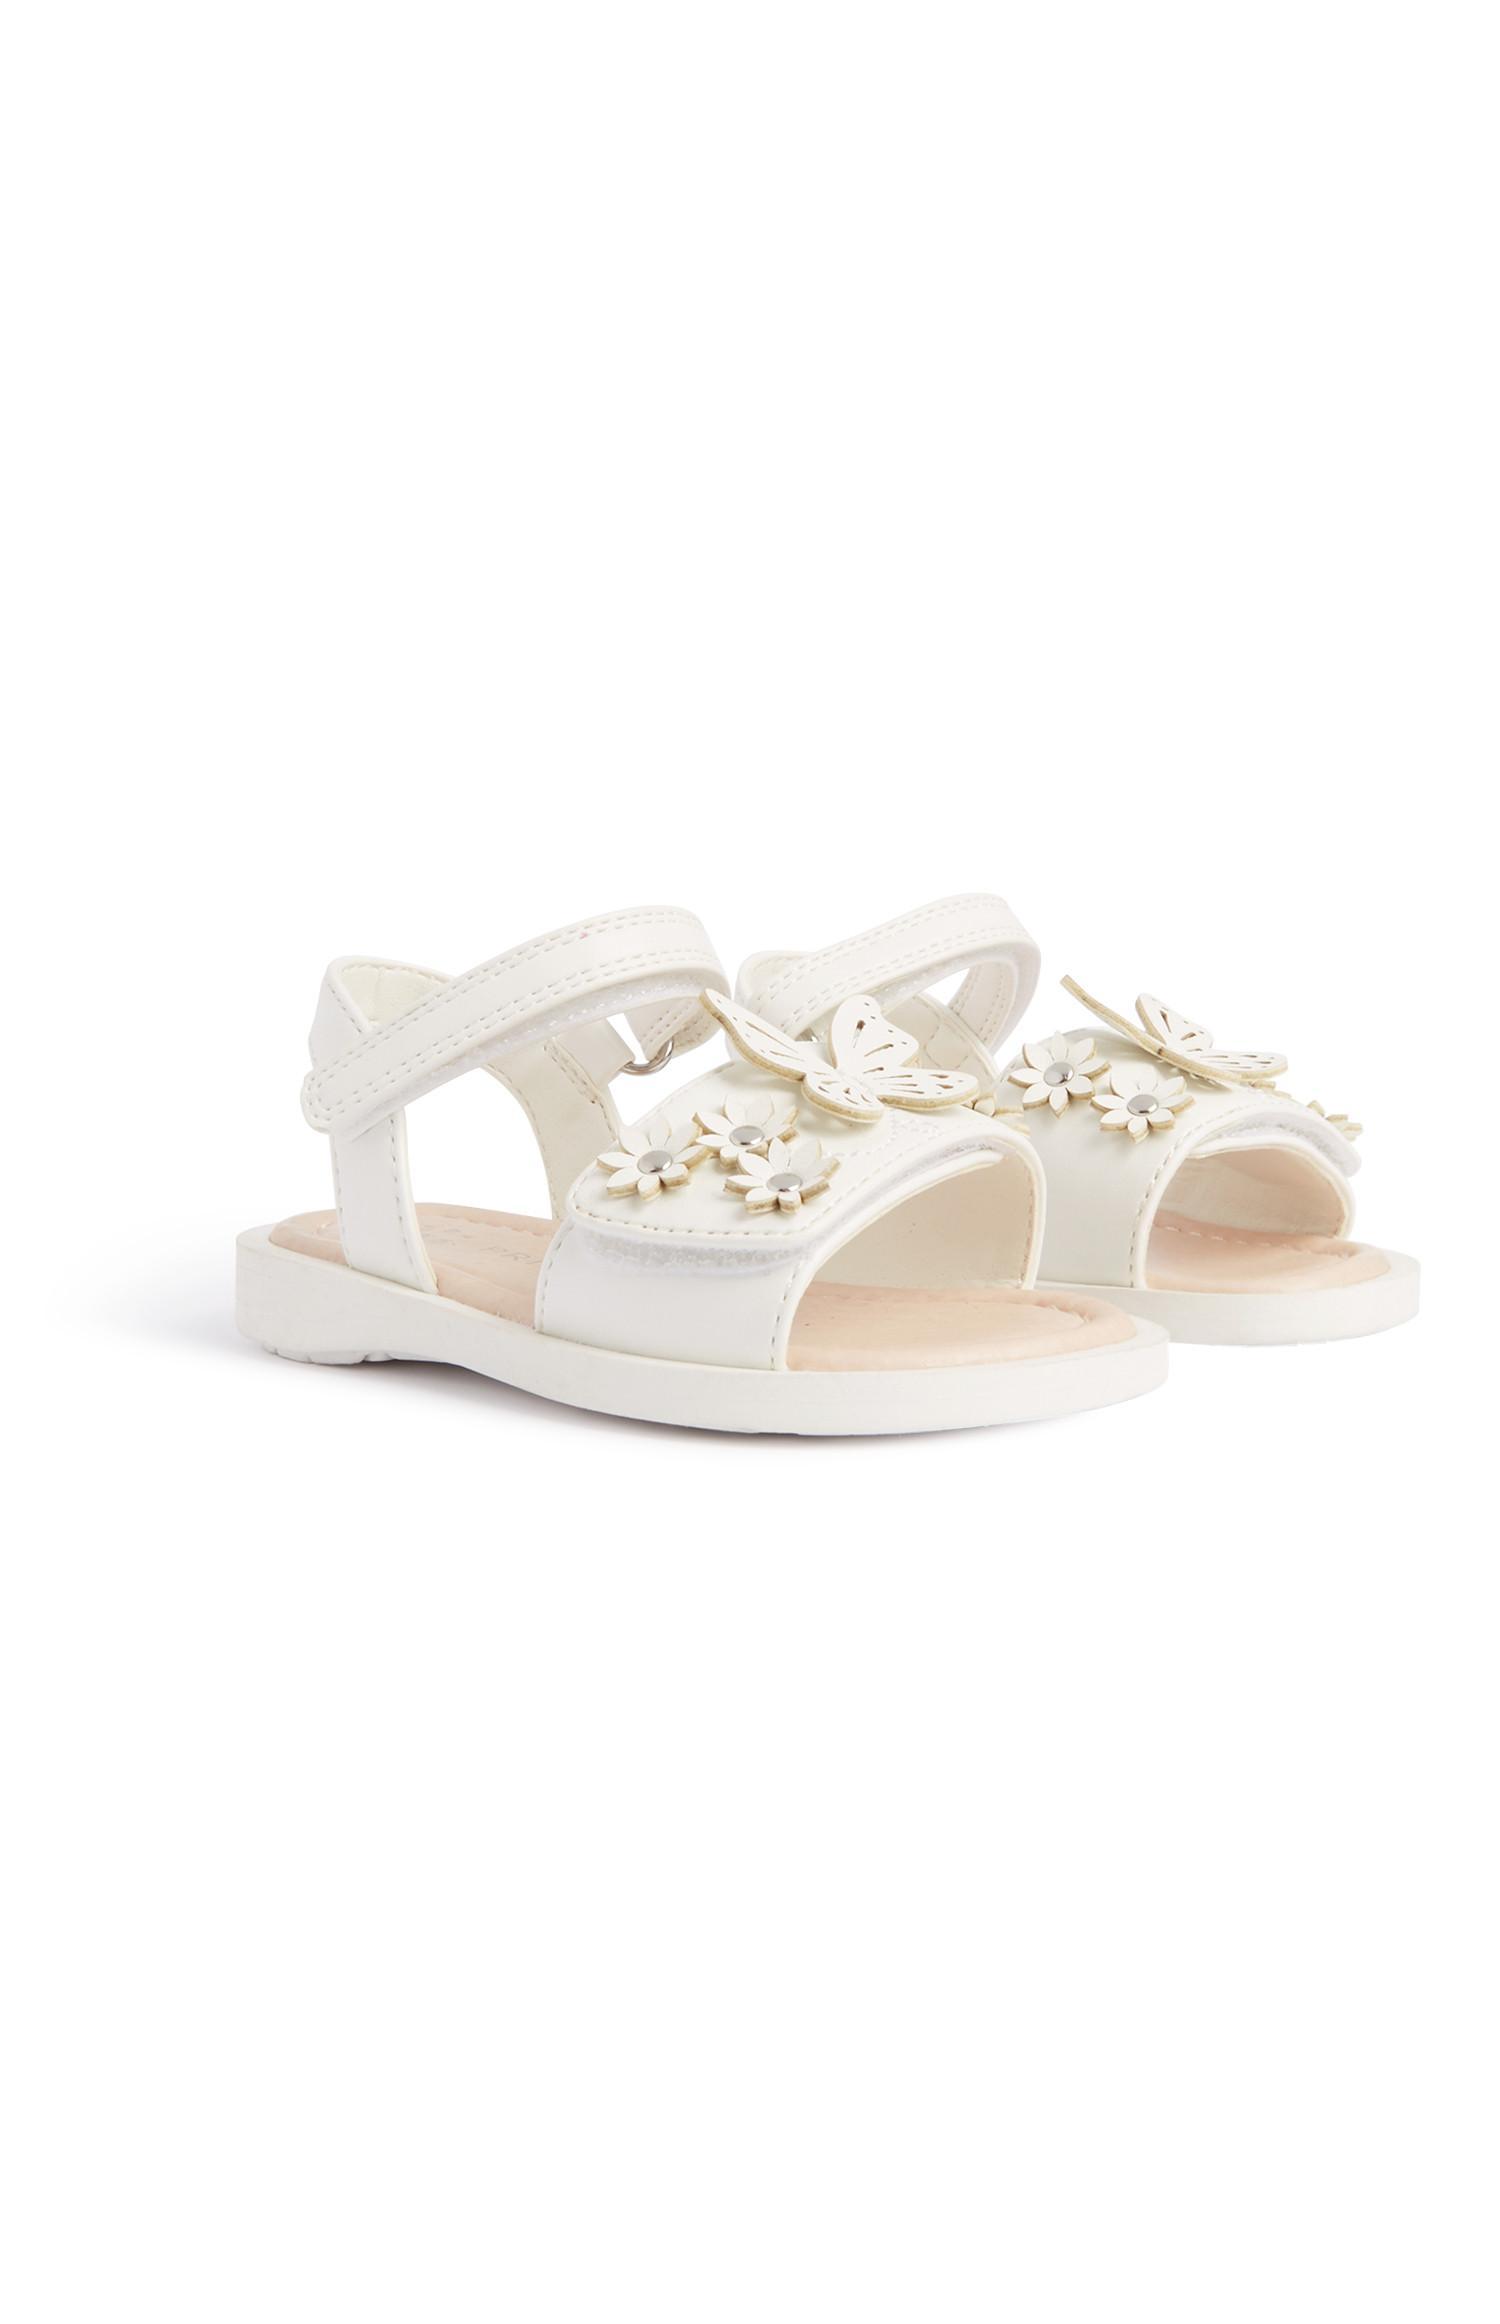 Witte Pre Walker sandalen voor meisjes